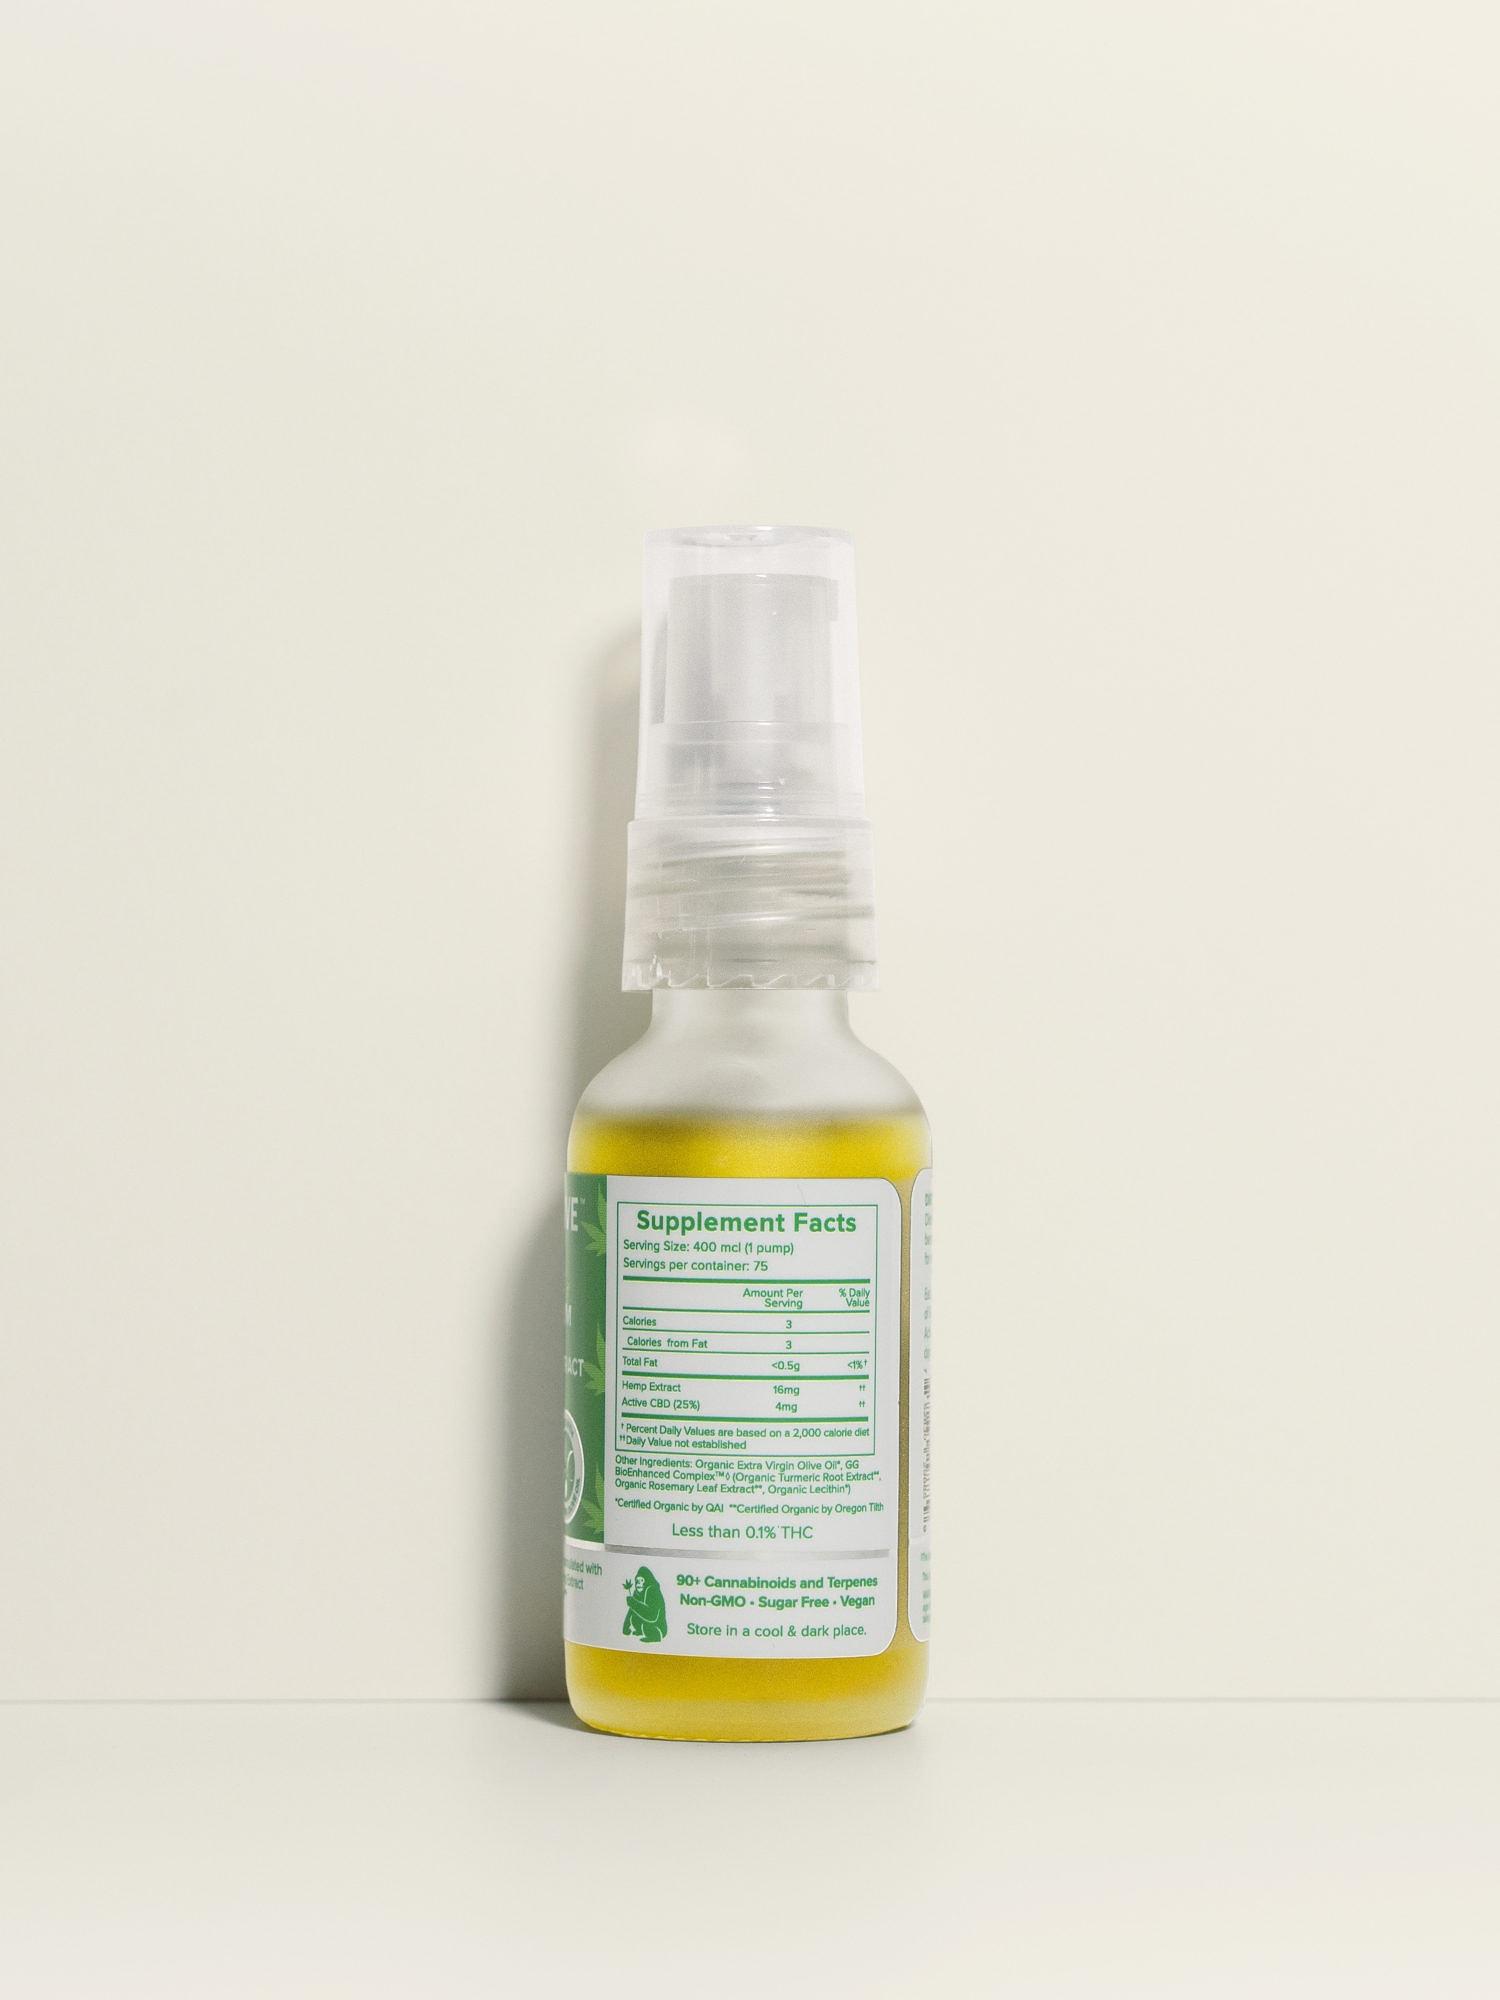 Buy USDA Certified Organic Full Spectrum CBD Oil - 1200 mg